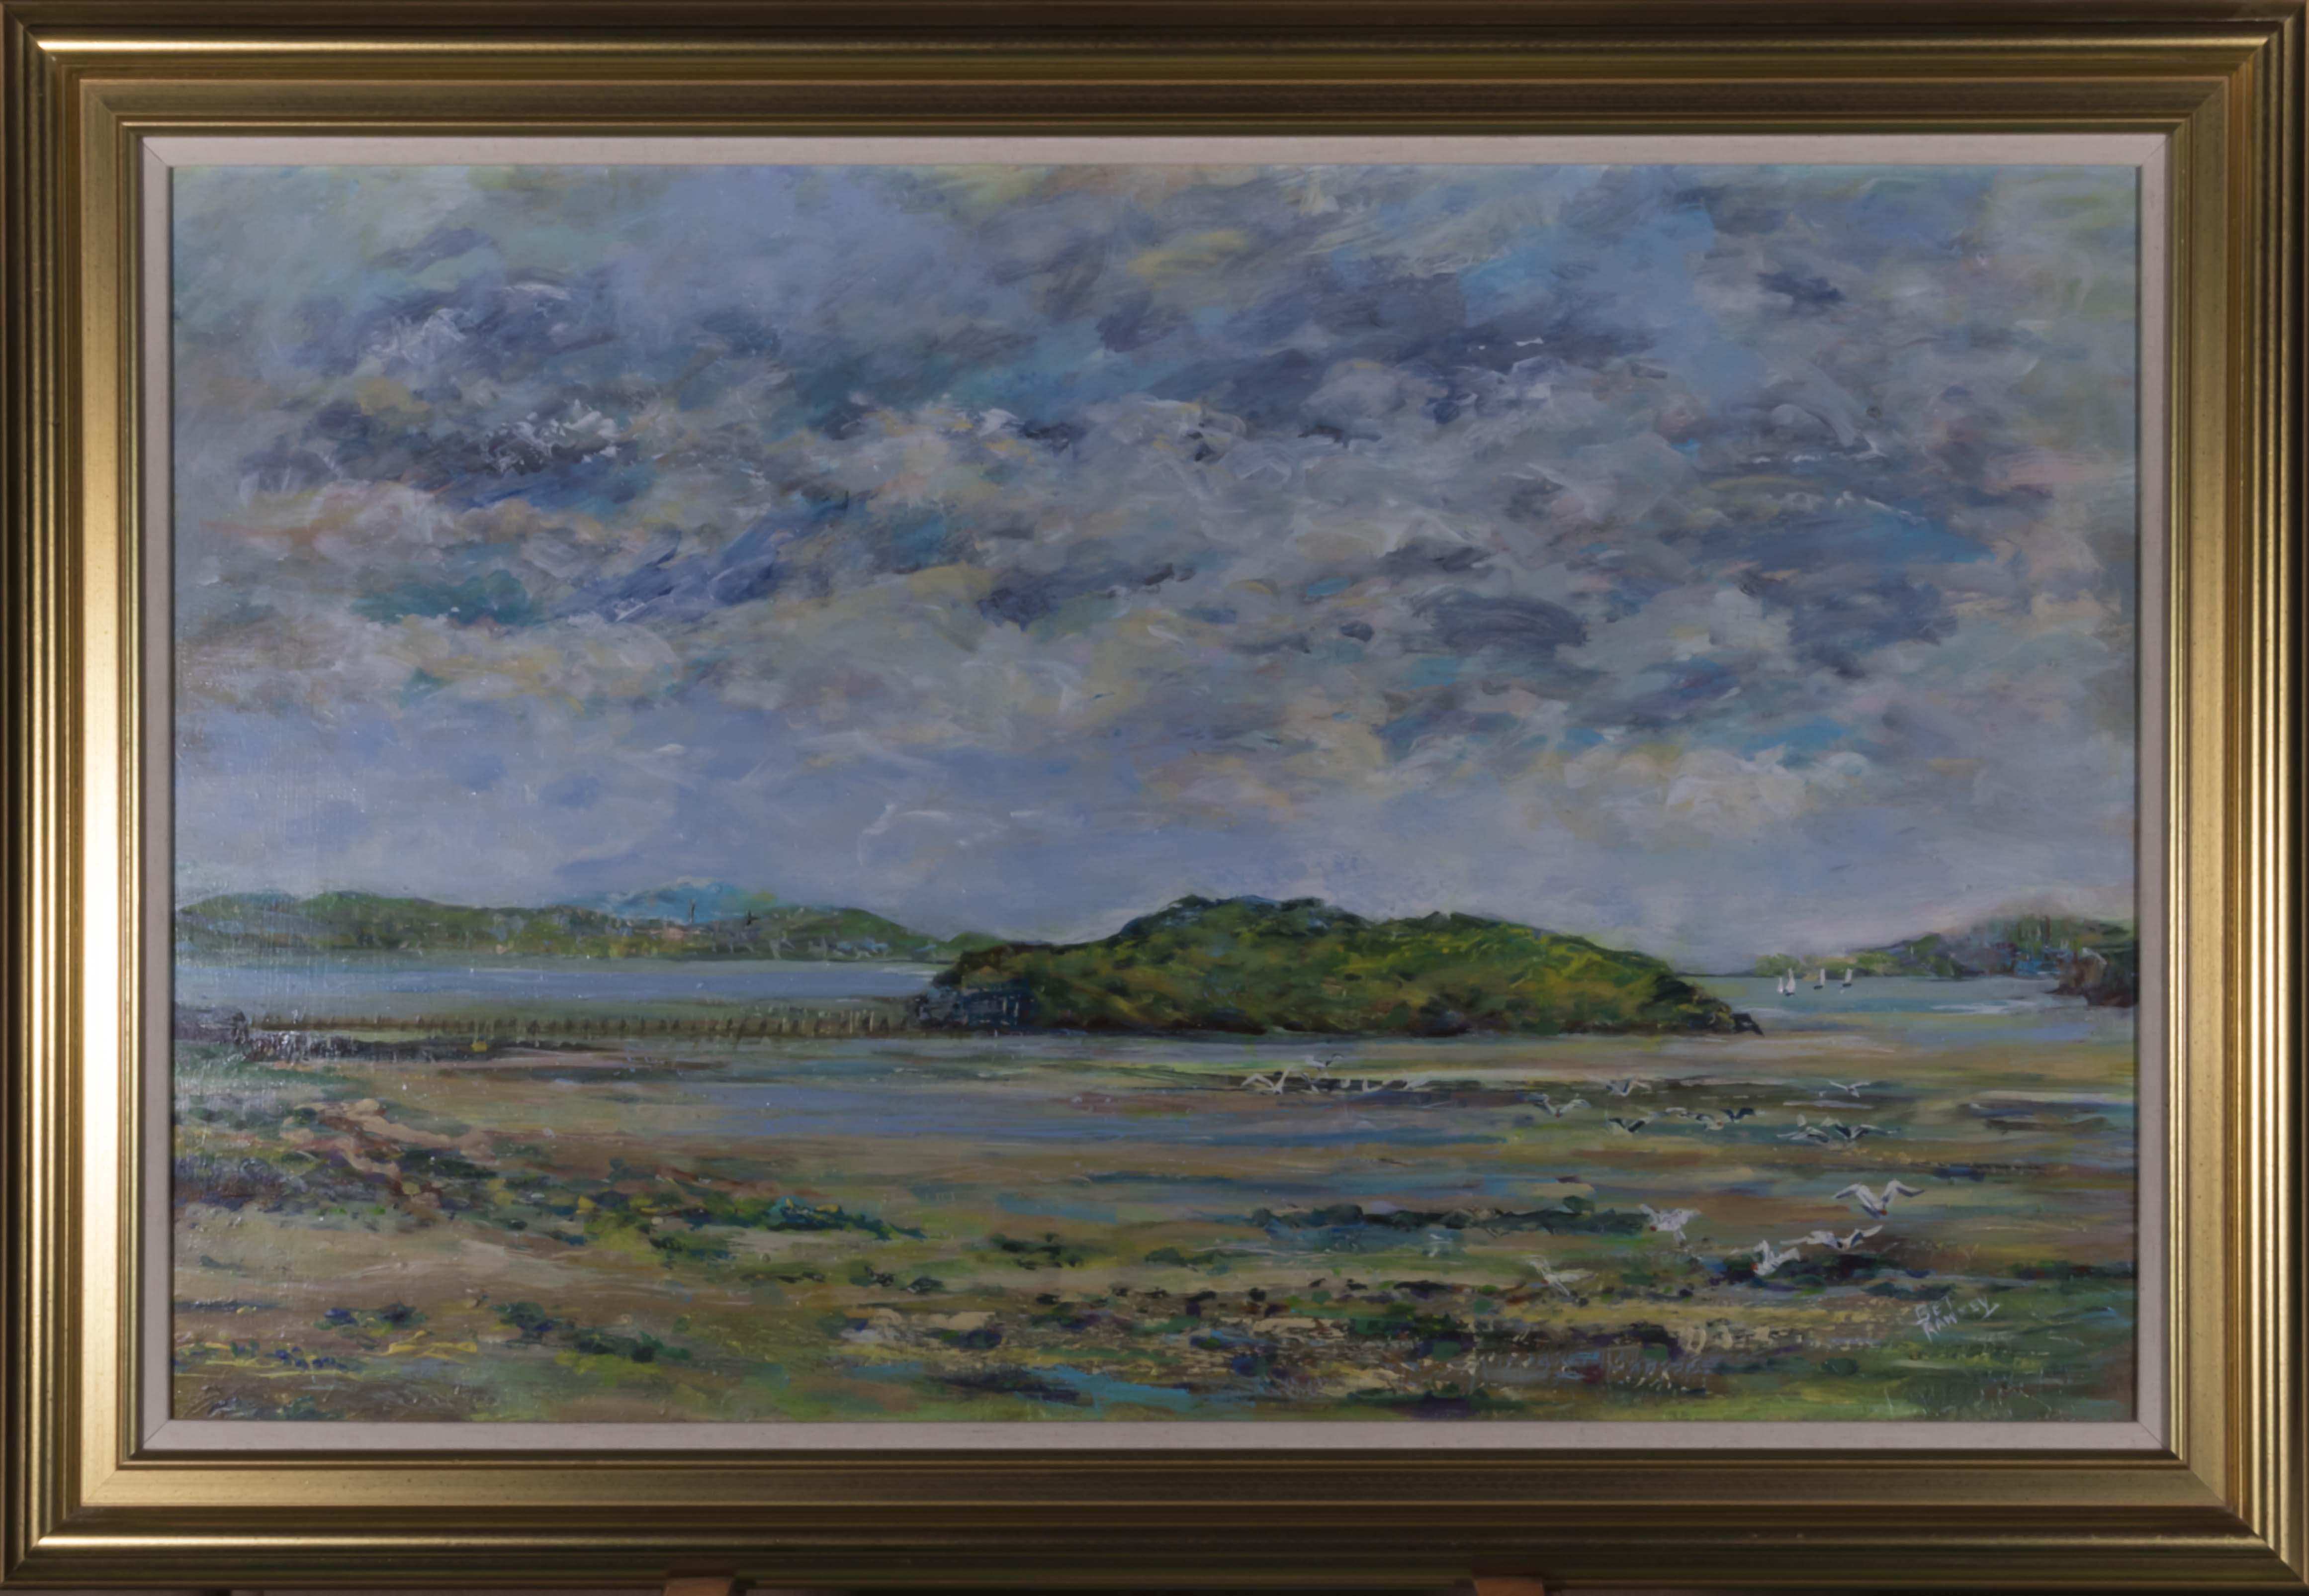 Lot 43 - A framed oil on board depicting a coastal scene, signed Bet Ramsey, image size 45cm x 70cm